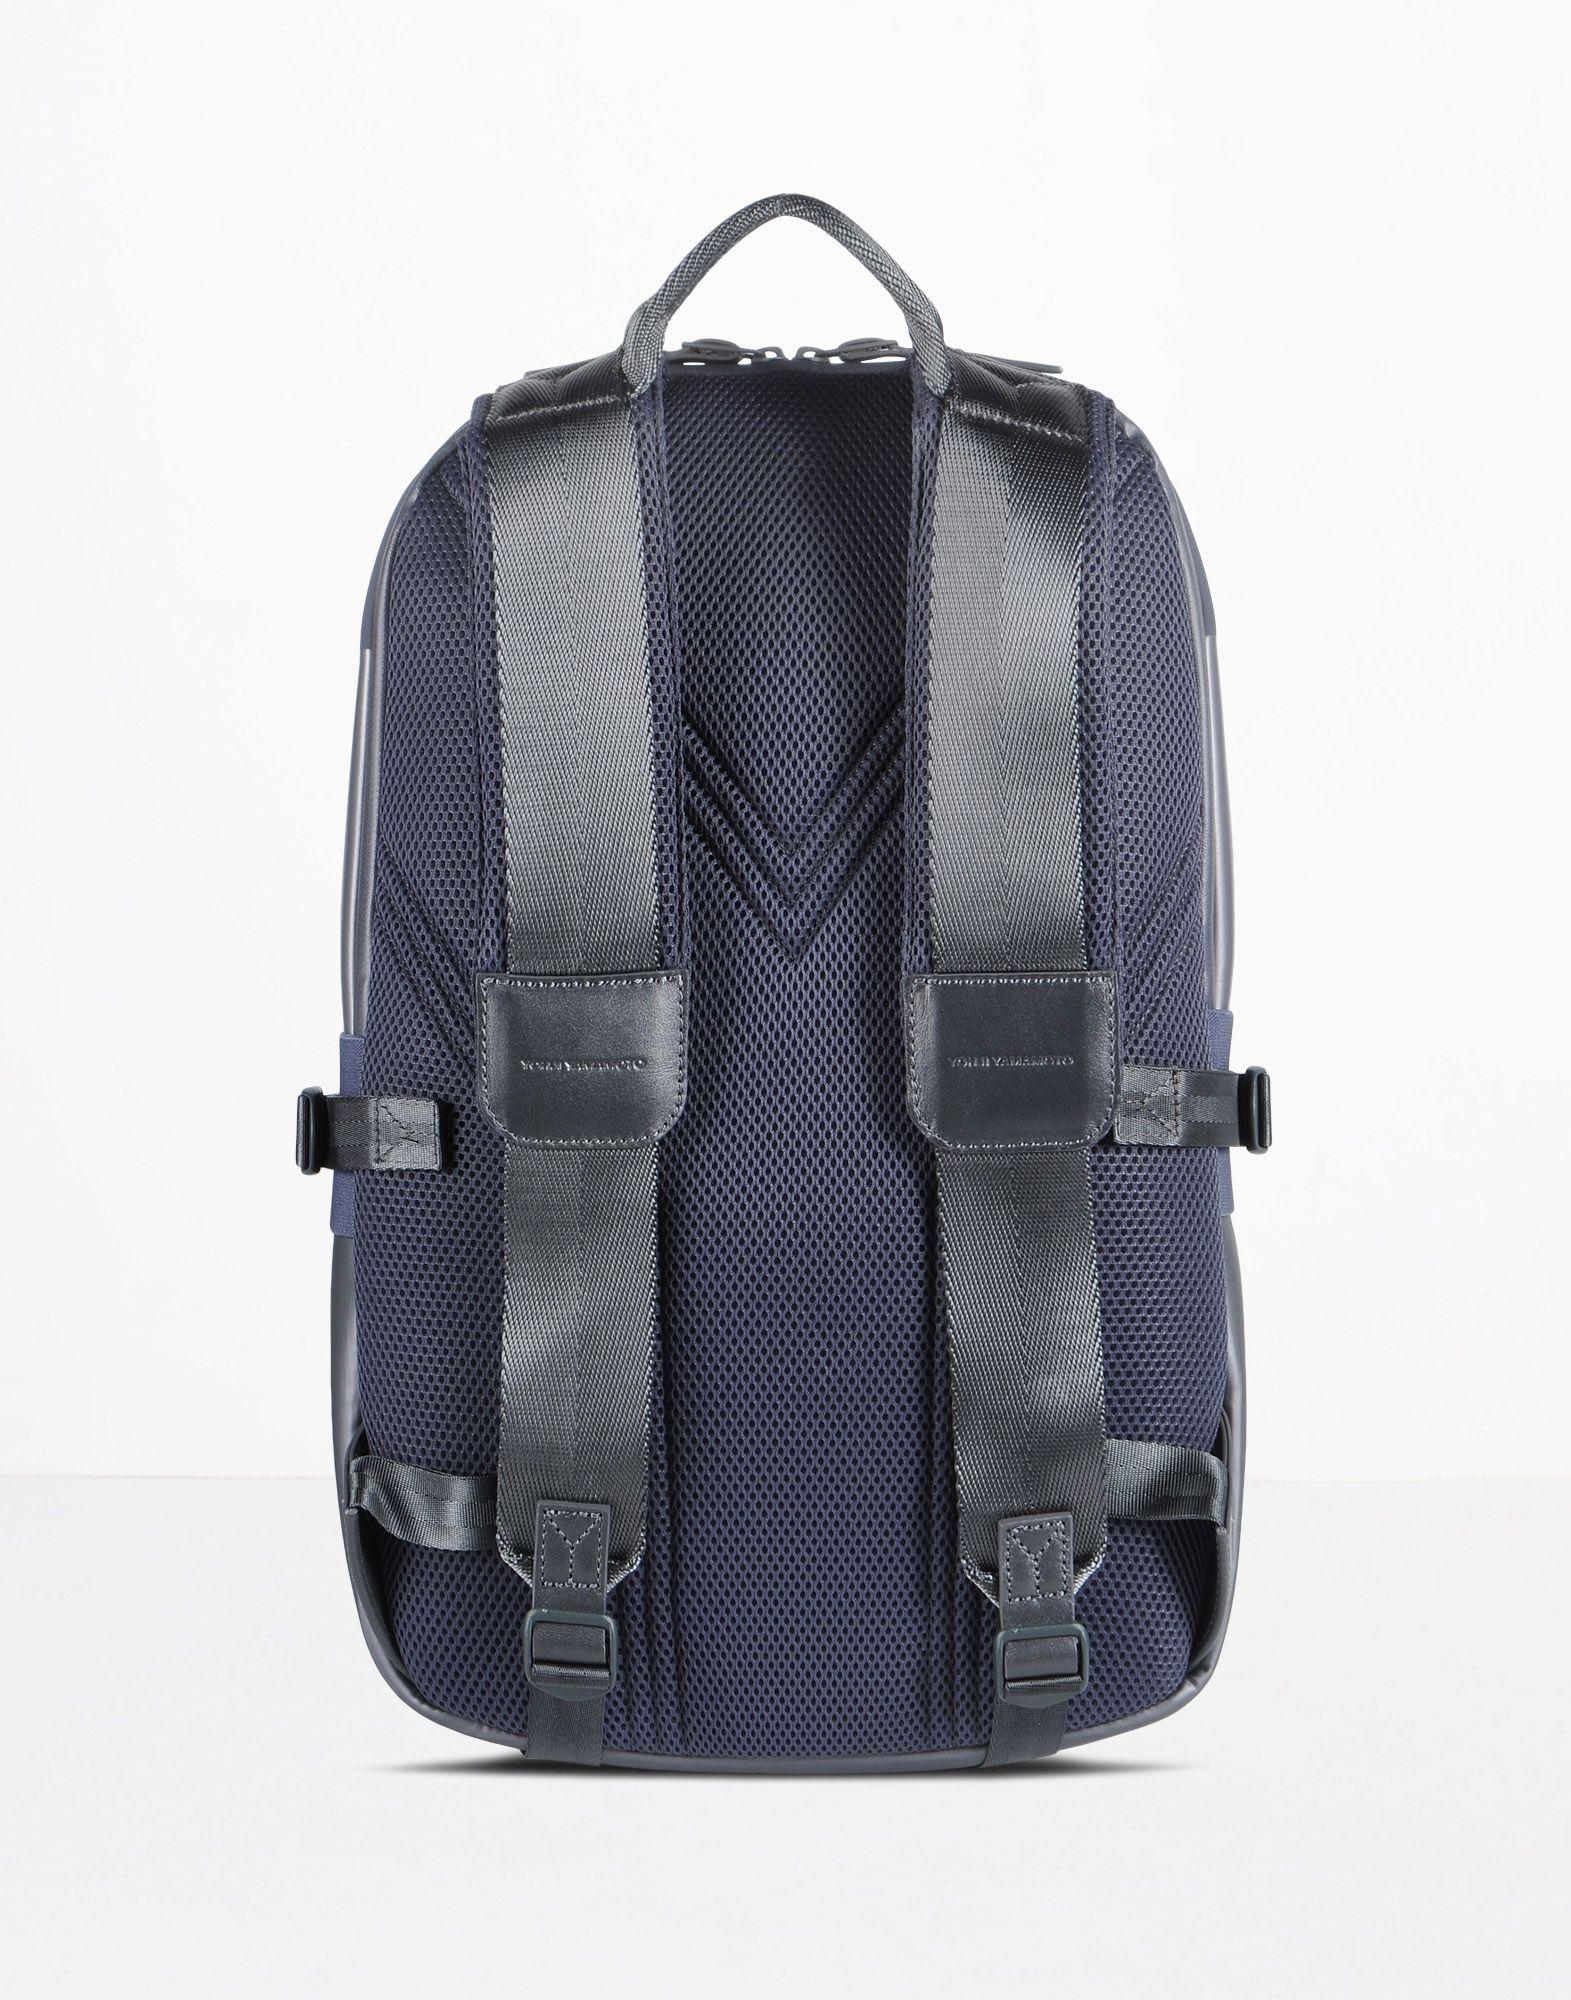 9f56331a19d5 ... Y-3 Y-3 QASA BACKPACK Backpack E e ...